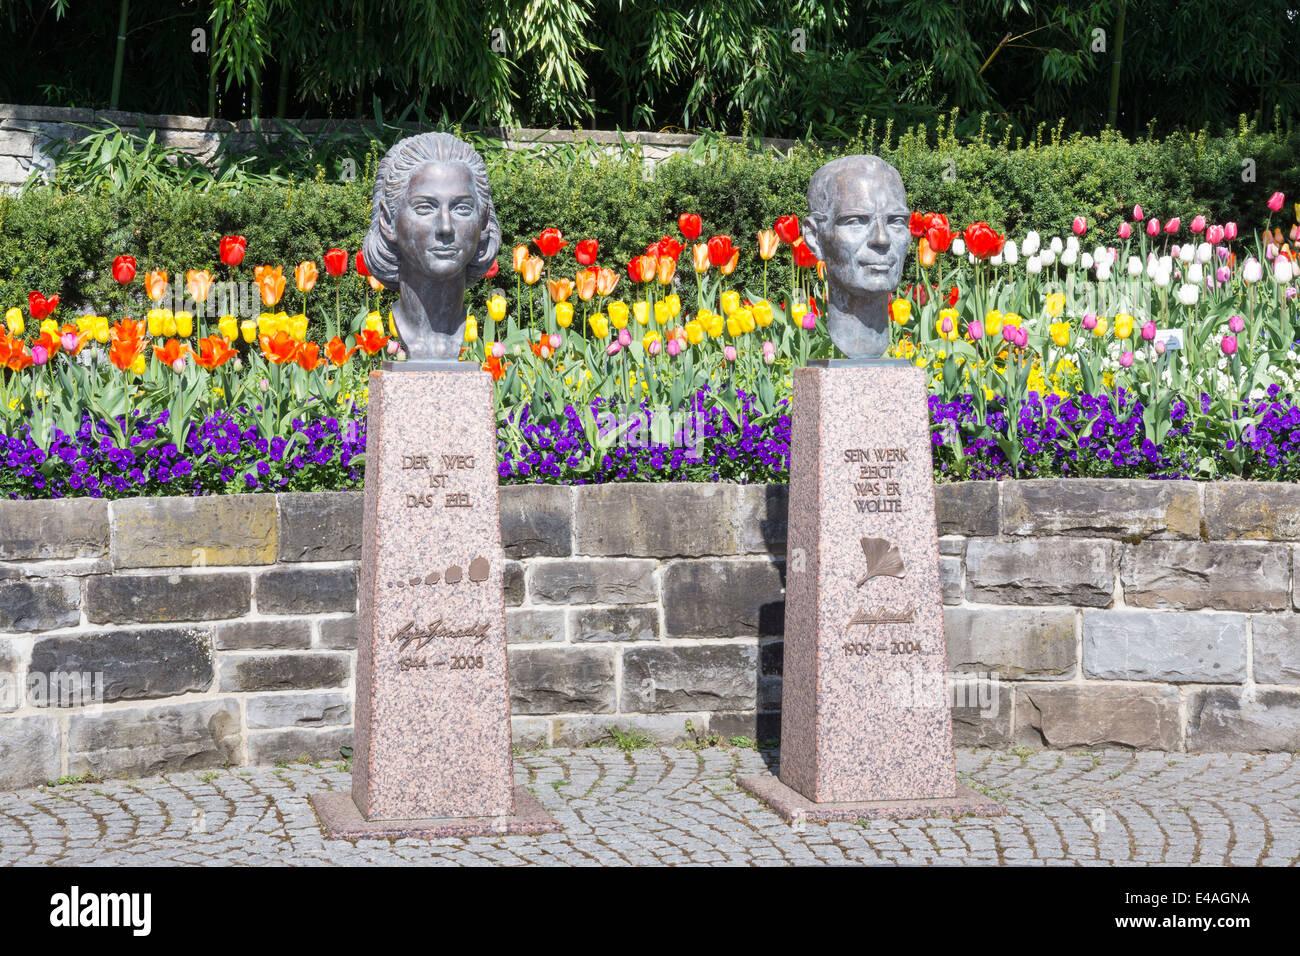 Germany, Baden-Wuerttemberg, Mainau, Busts of Sonja and Lennart Bernadotte - Stock Image